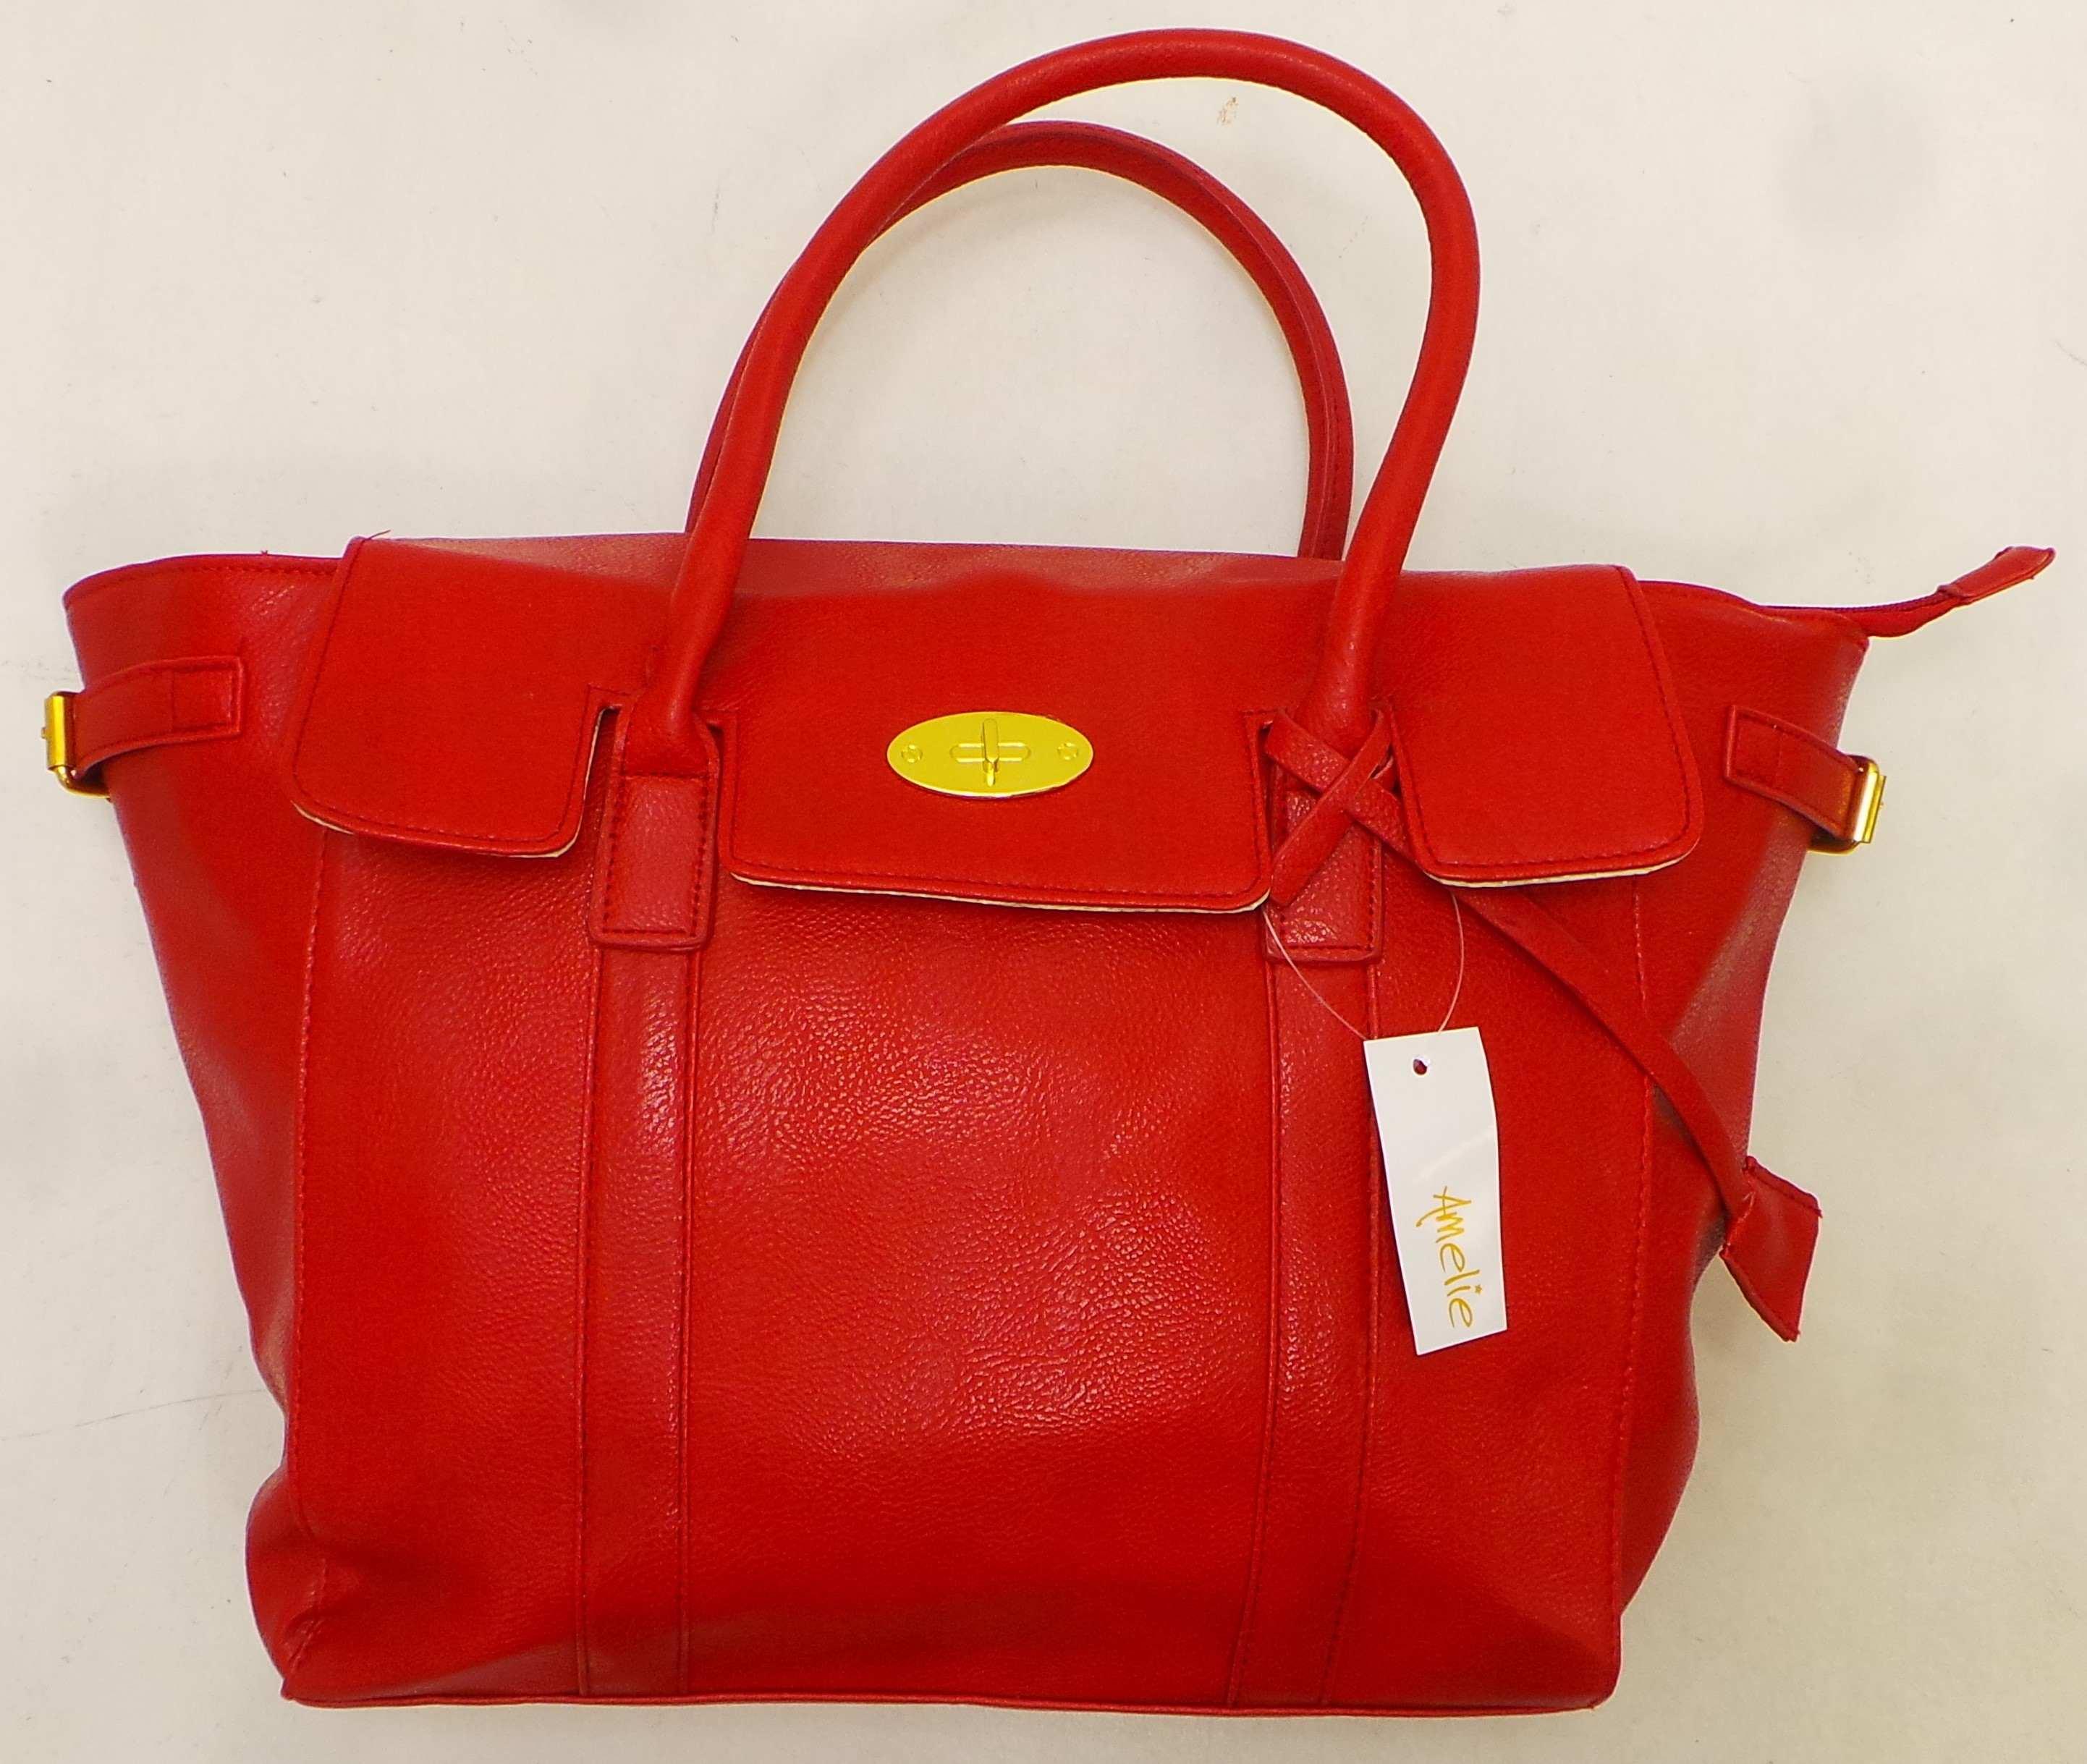 Wholesale Joblot of 10 Amelie Ladies Red Handbags